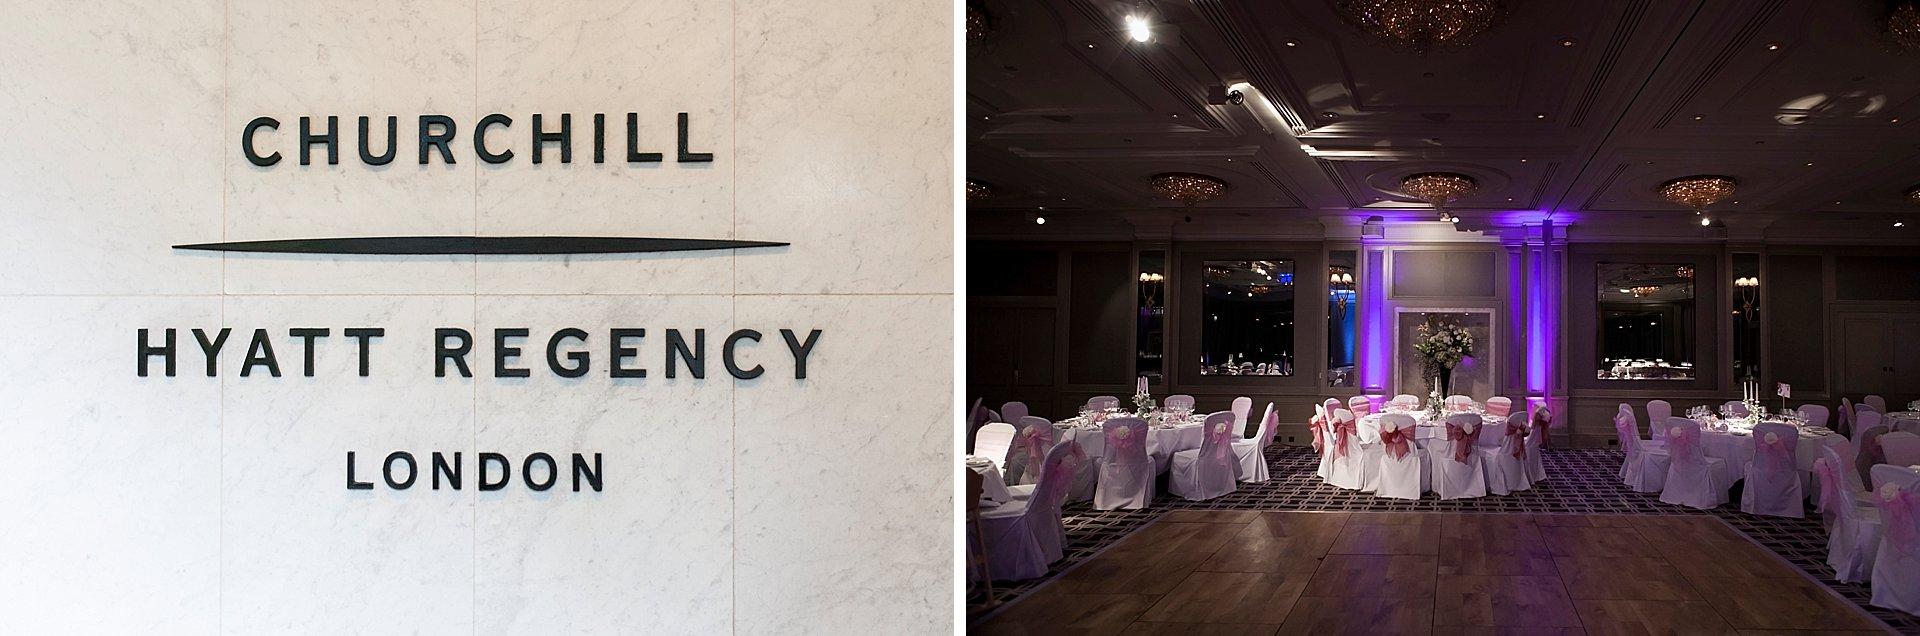 Hyatt Regency London